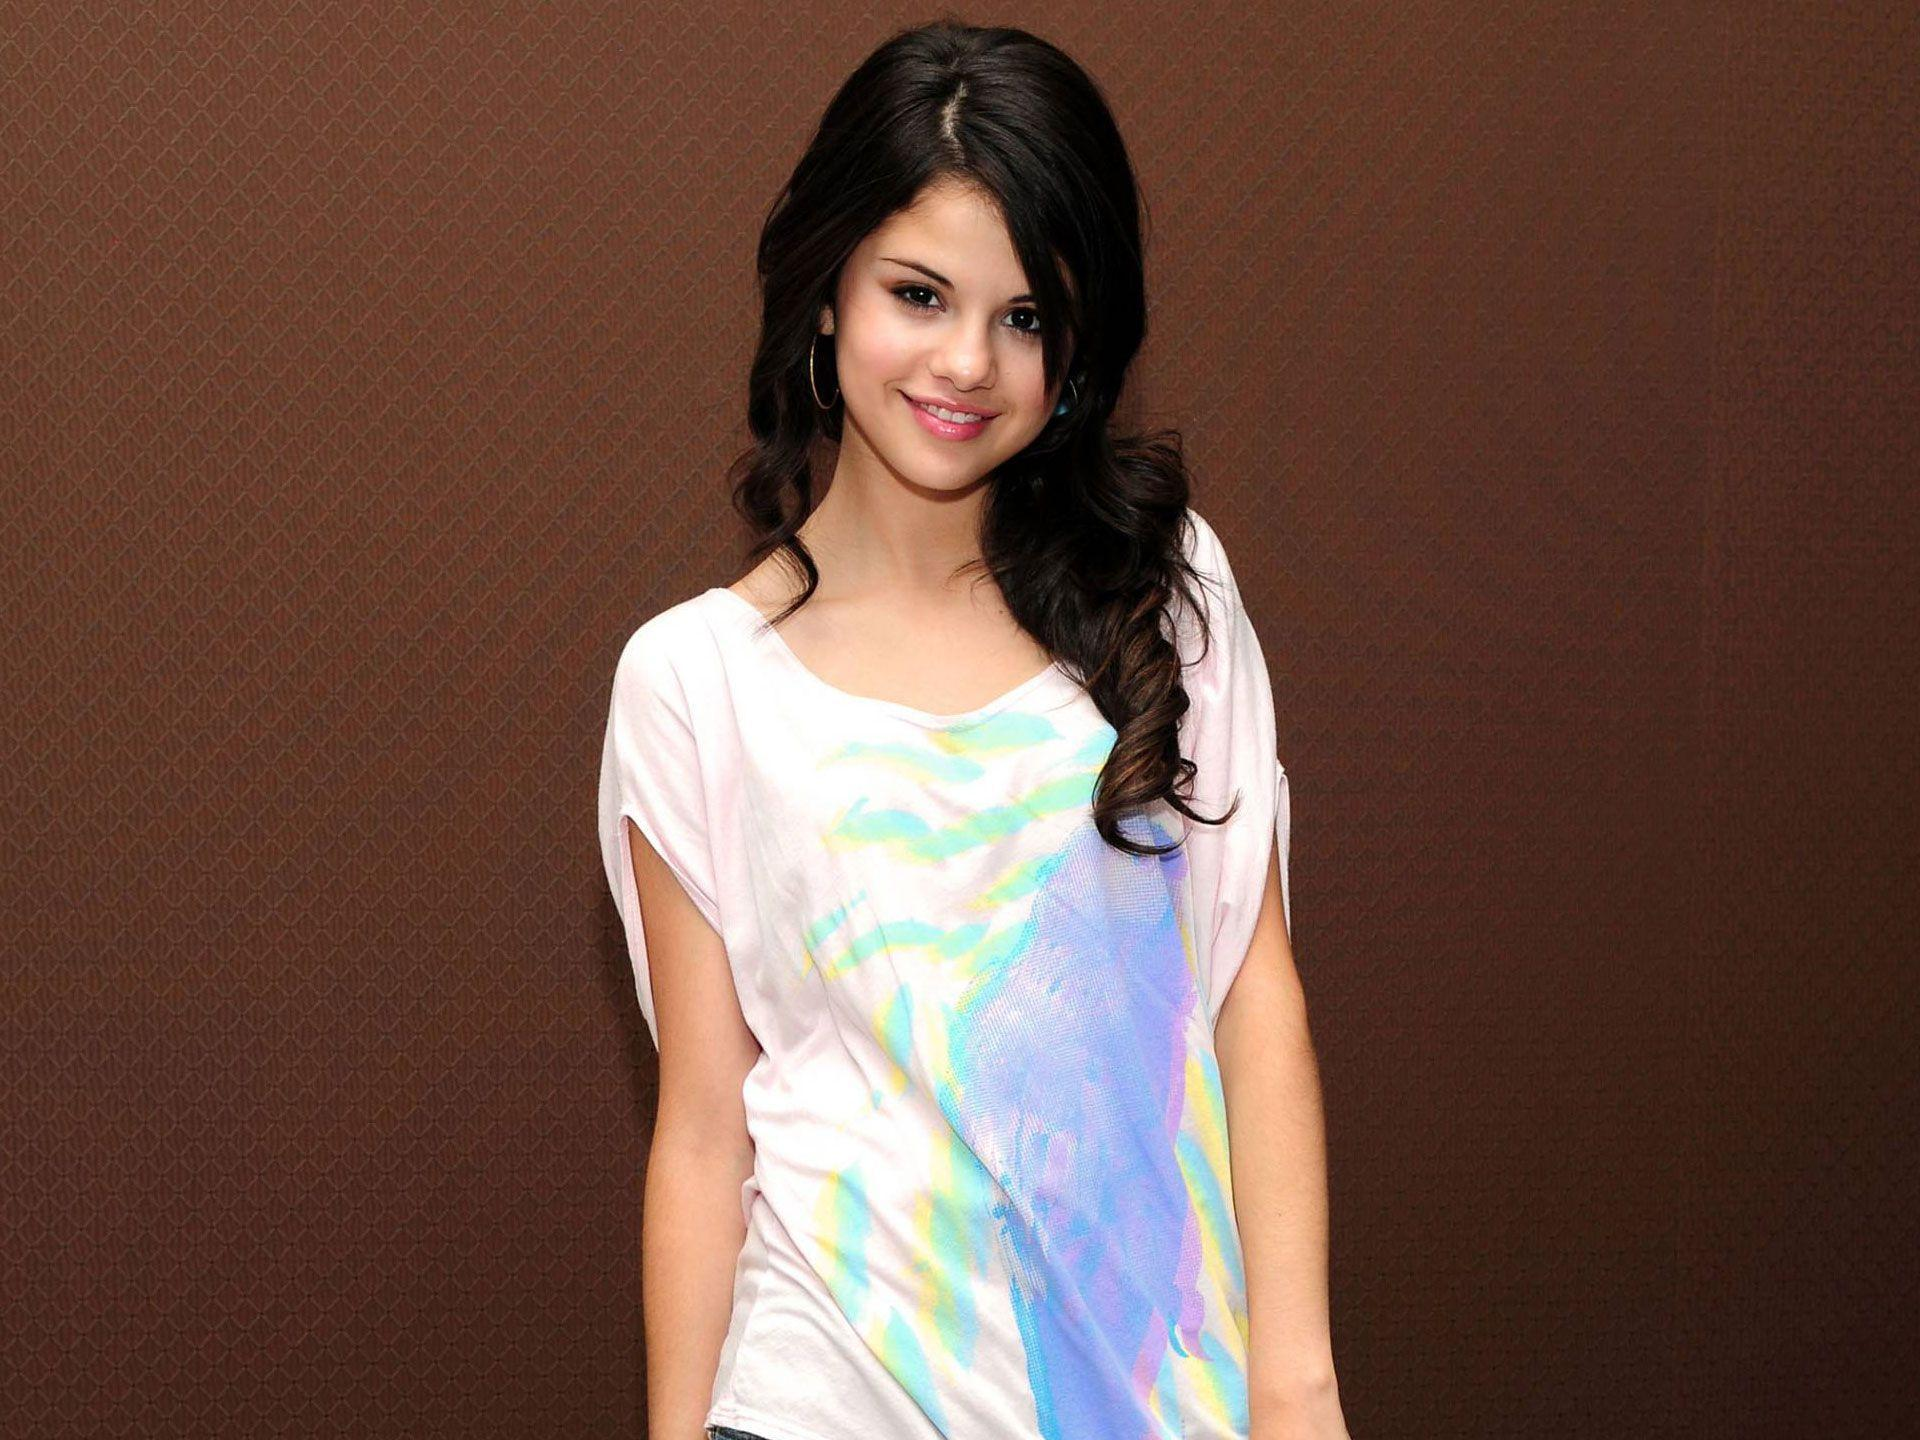 Selena Gomez HD PC Wallpapers - HD Wallpapers Inn